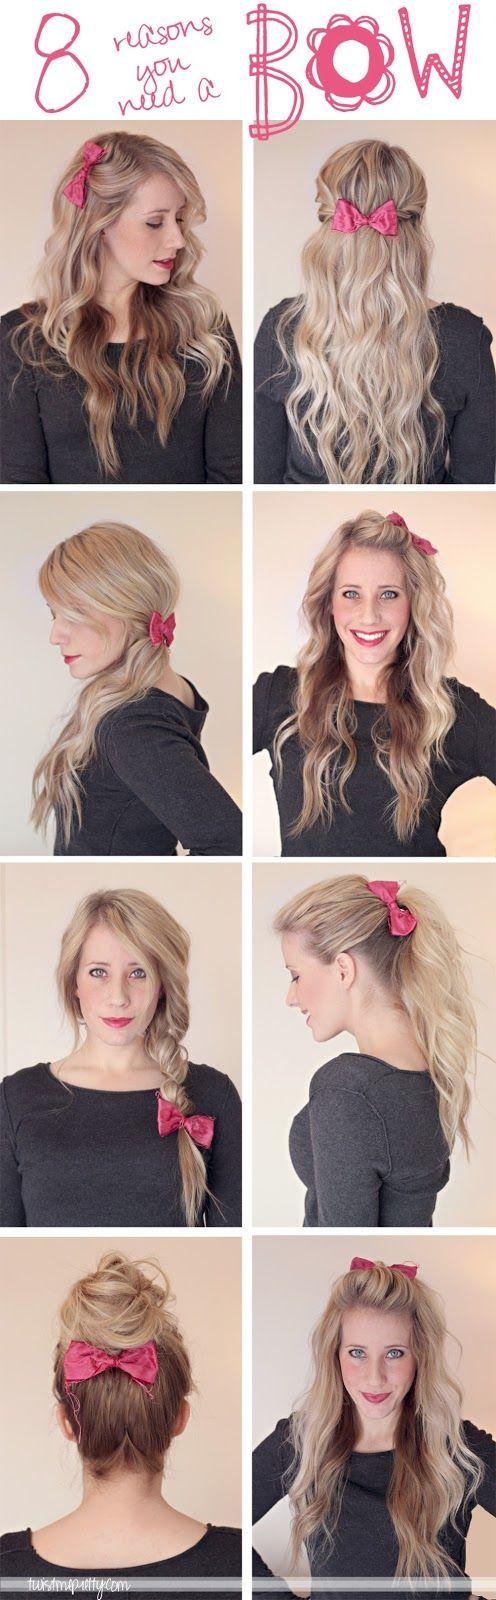 8 Ways To Style A Bow Twist Me Pretty Hair Styles Long Hair Styles Hair Beauty